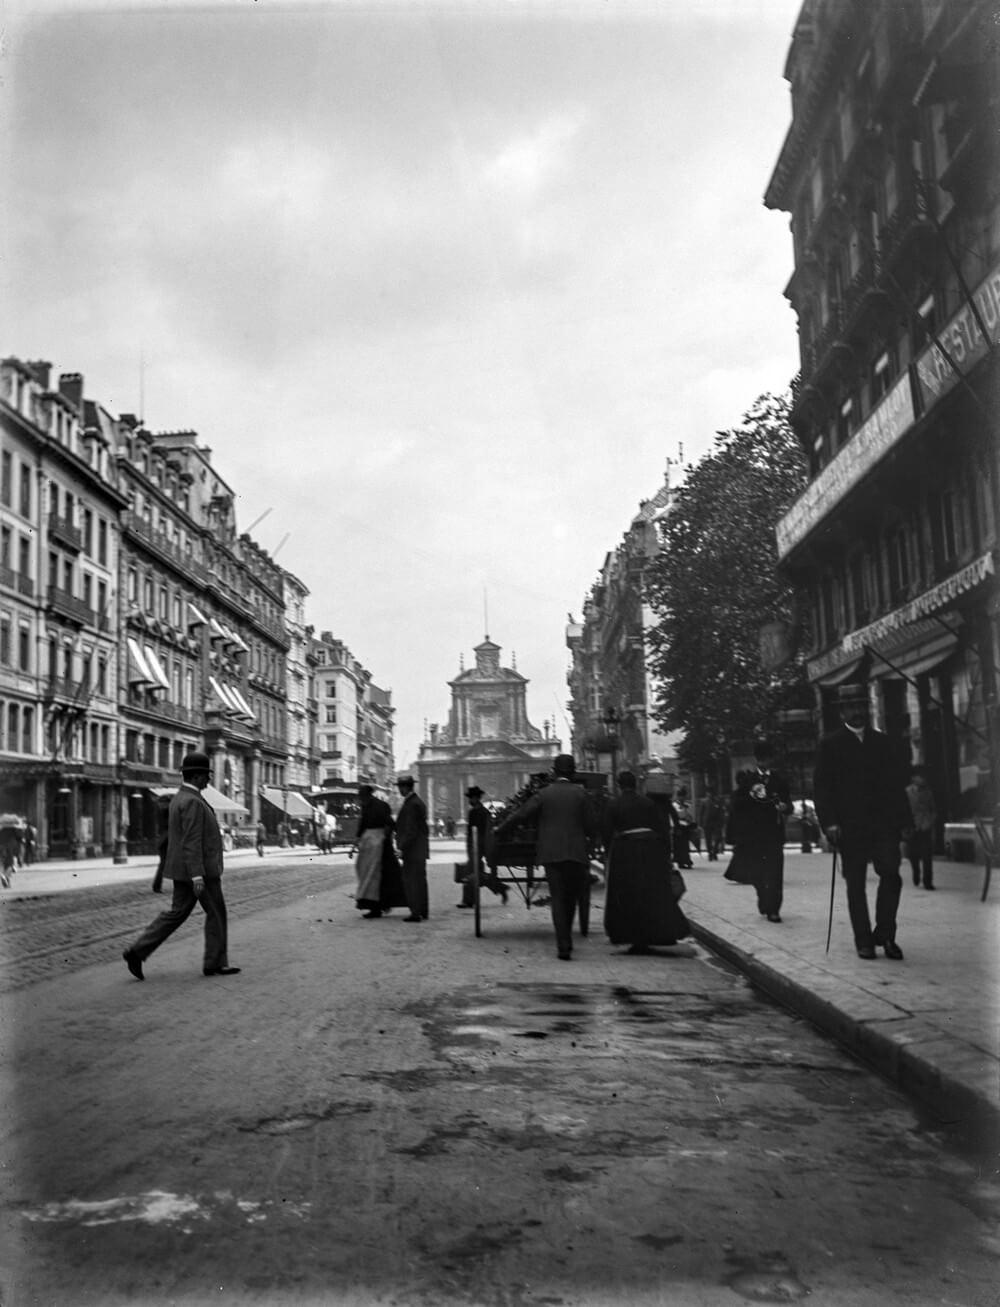 Emile-Henri t'Serstevens.Charles Baudelaire, correspondentie Brussel, België.Vertaling Charles Baudelaire, Vertalingen Vivienne Stringa.